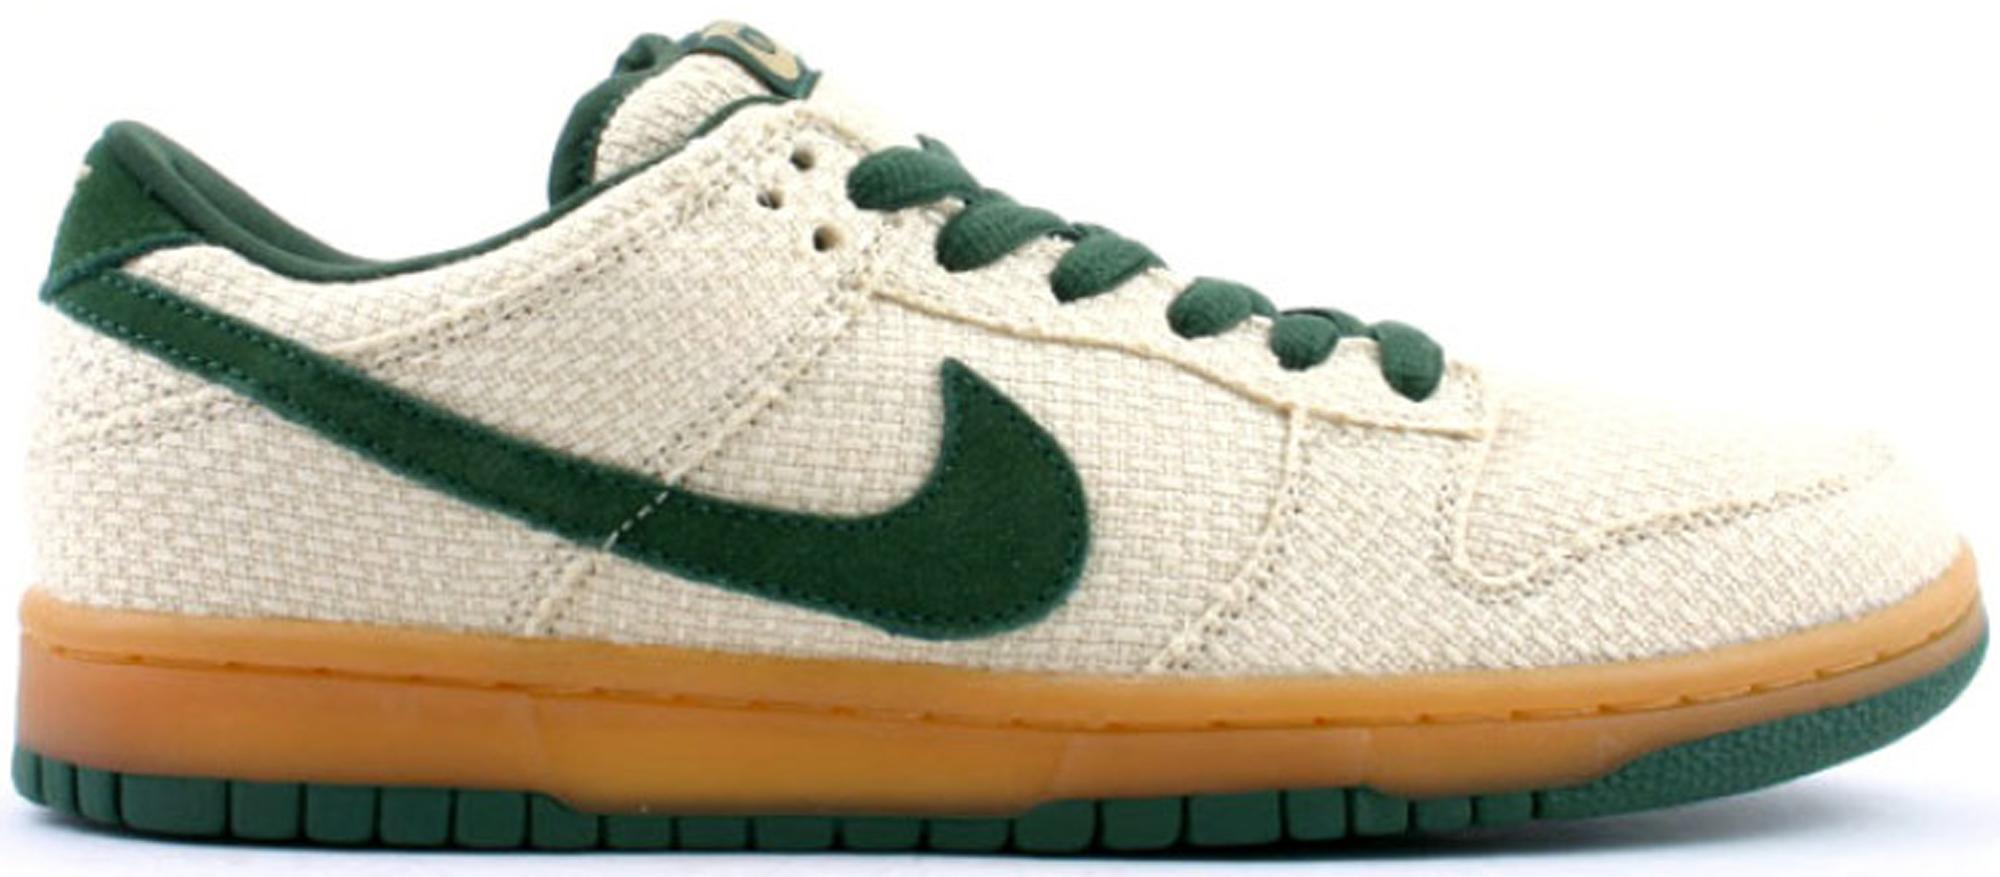 Nike SB Dunk Low Green Hemp - 304292-732